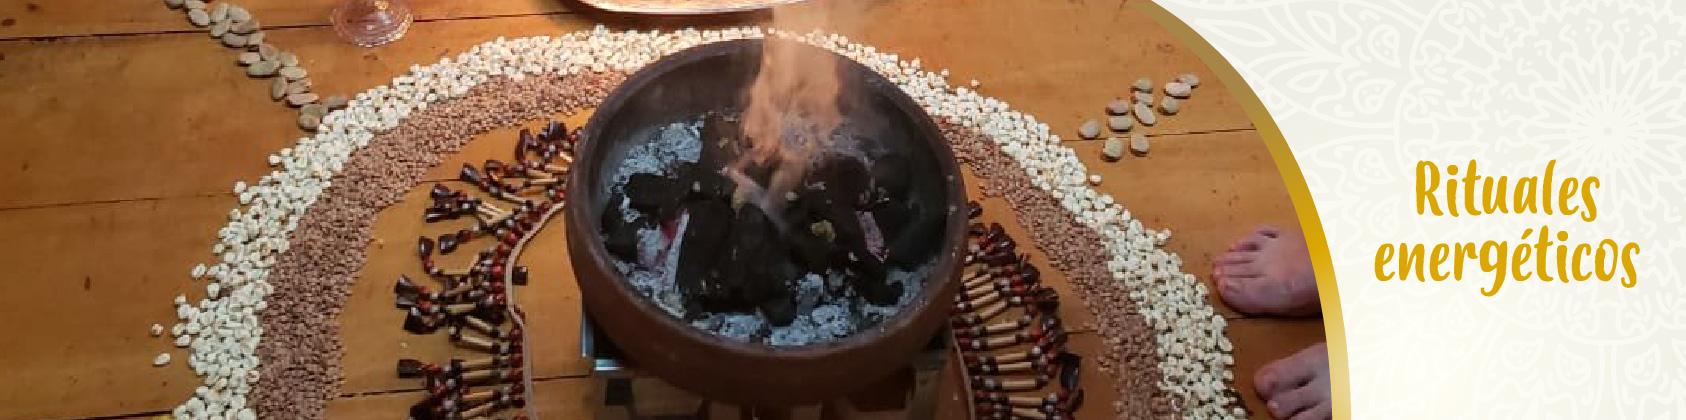 rituales-energeticos Madam cristal